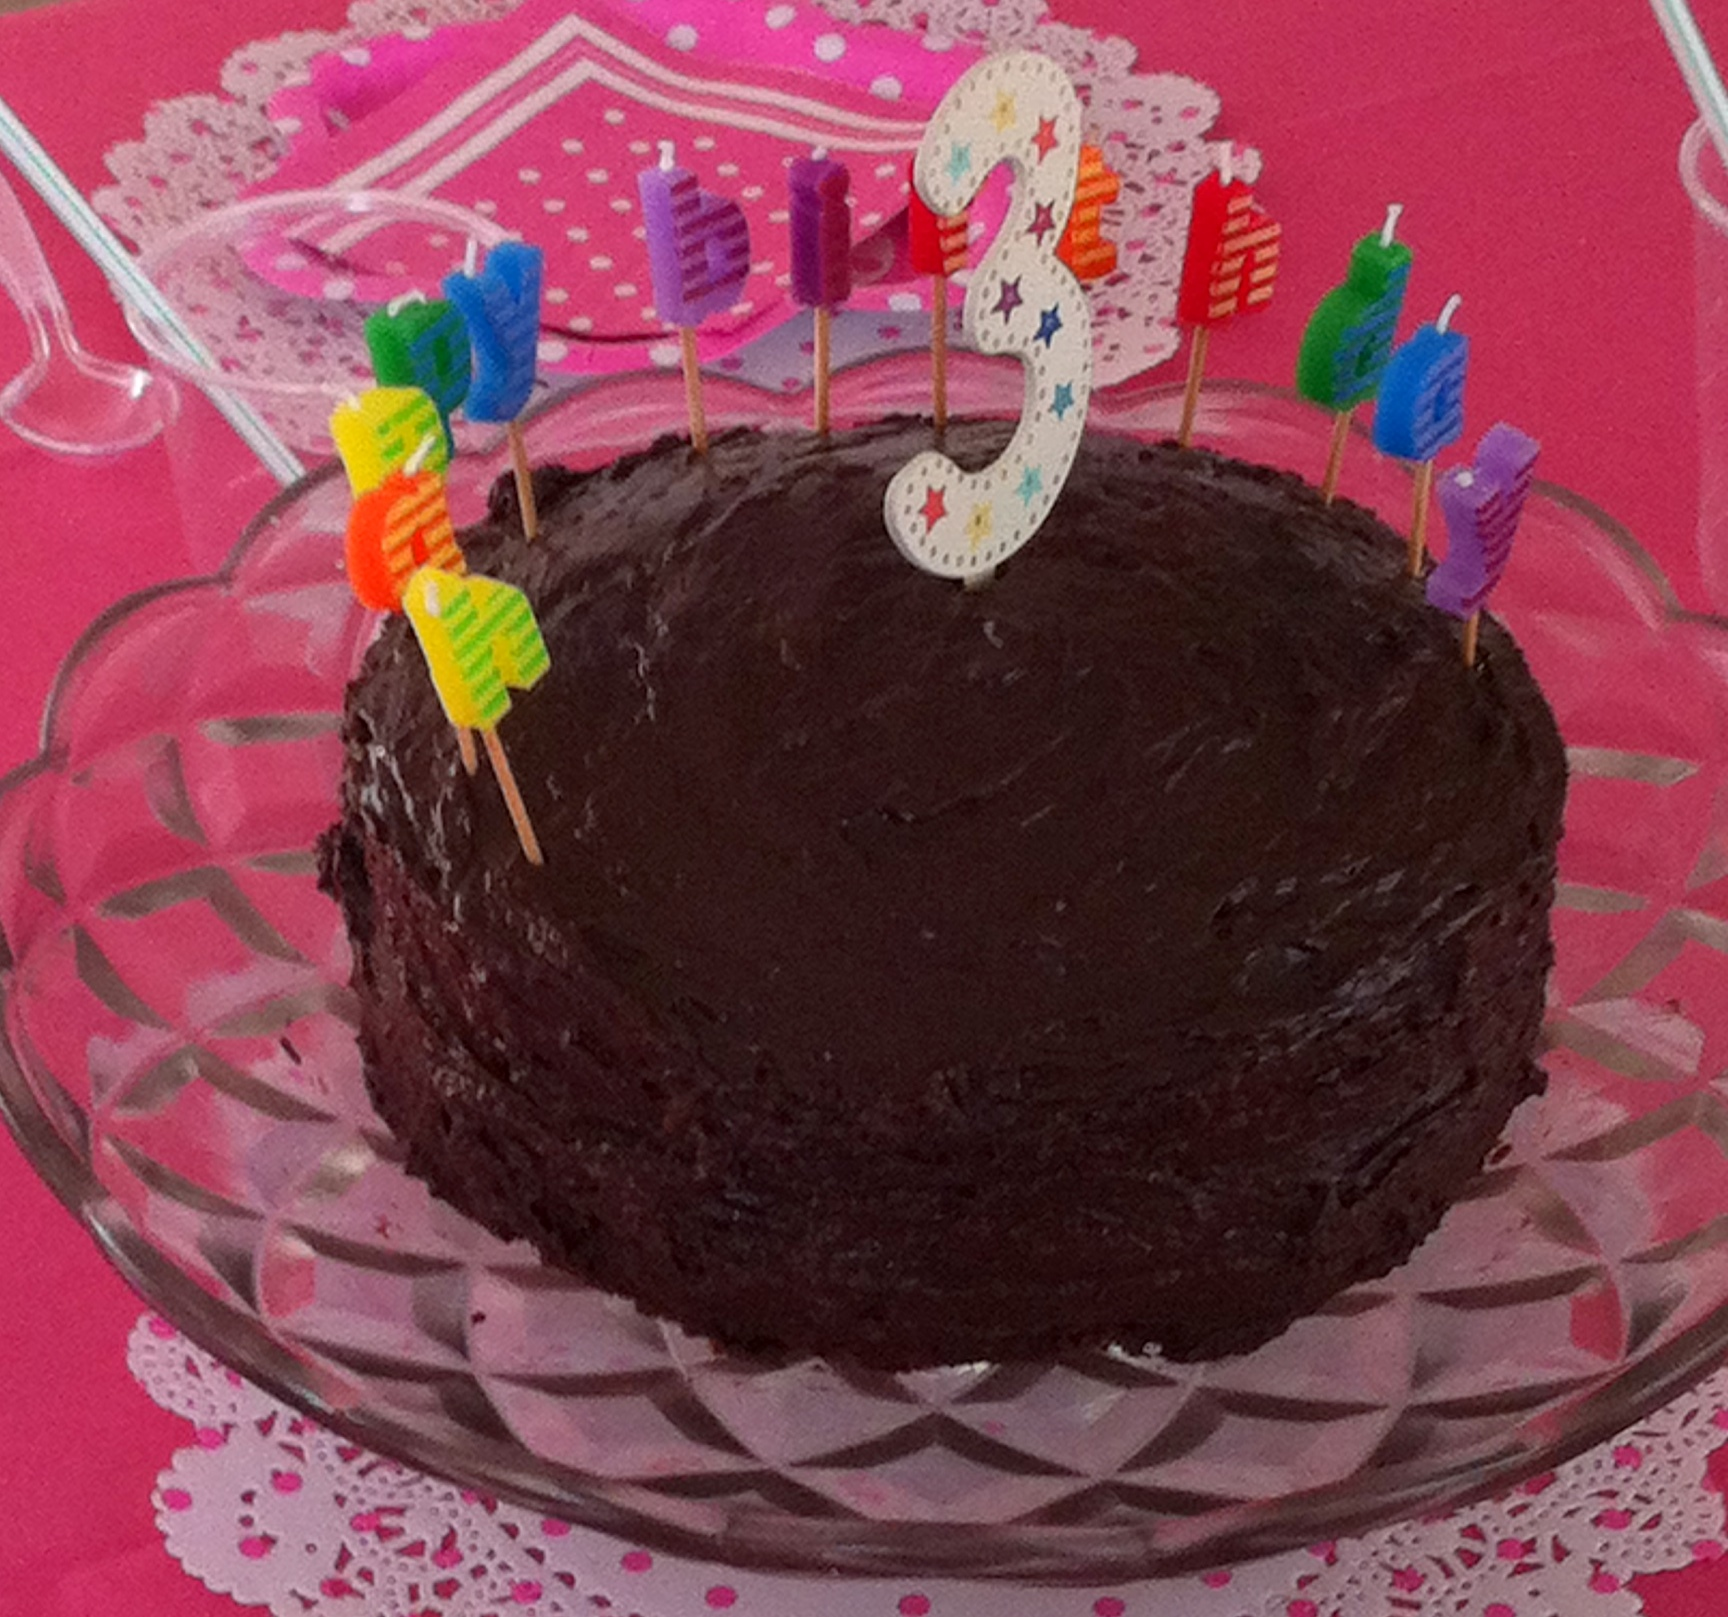 How To Make A Chocolate Train Birthday Cake